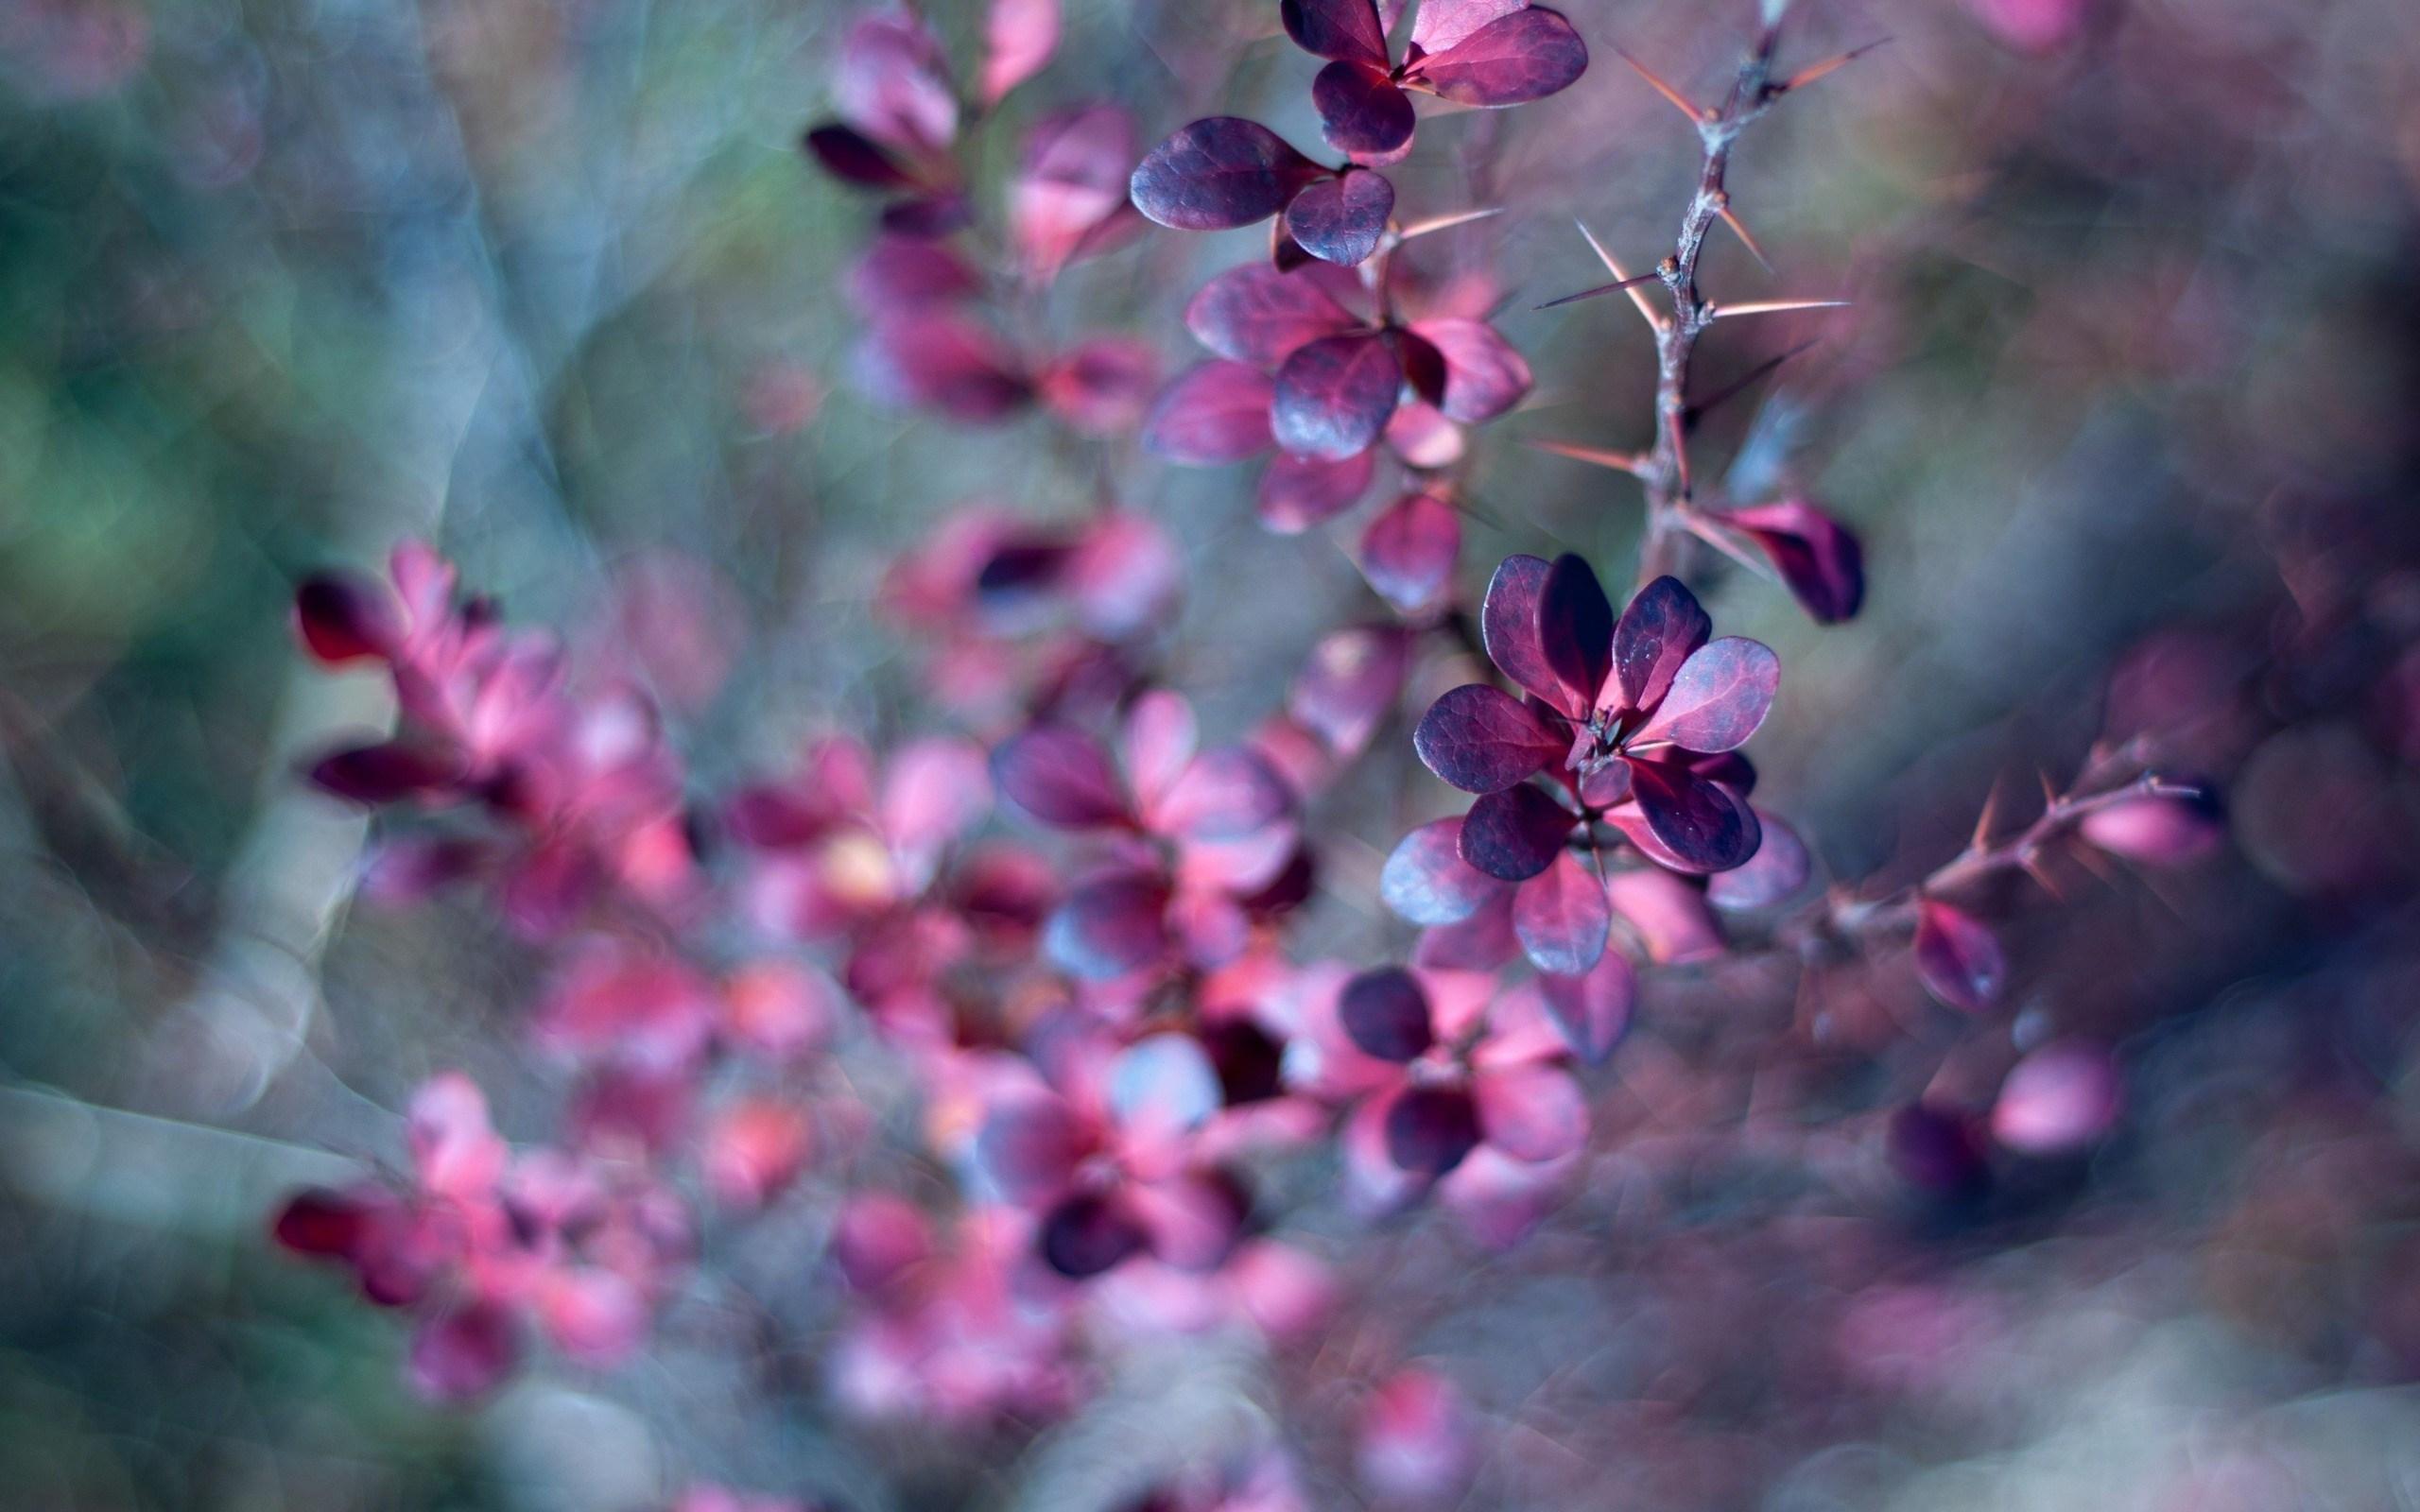 3d Screensavers Wallpaper Free Download Thorn Leaves Purple Forest Hd Desktop Wallpapers 4k Hd